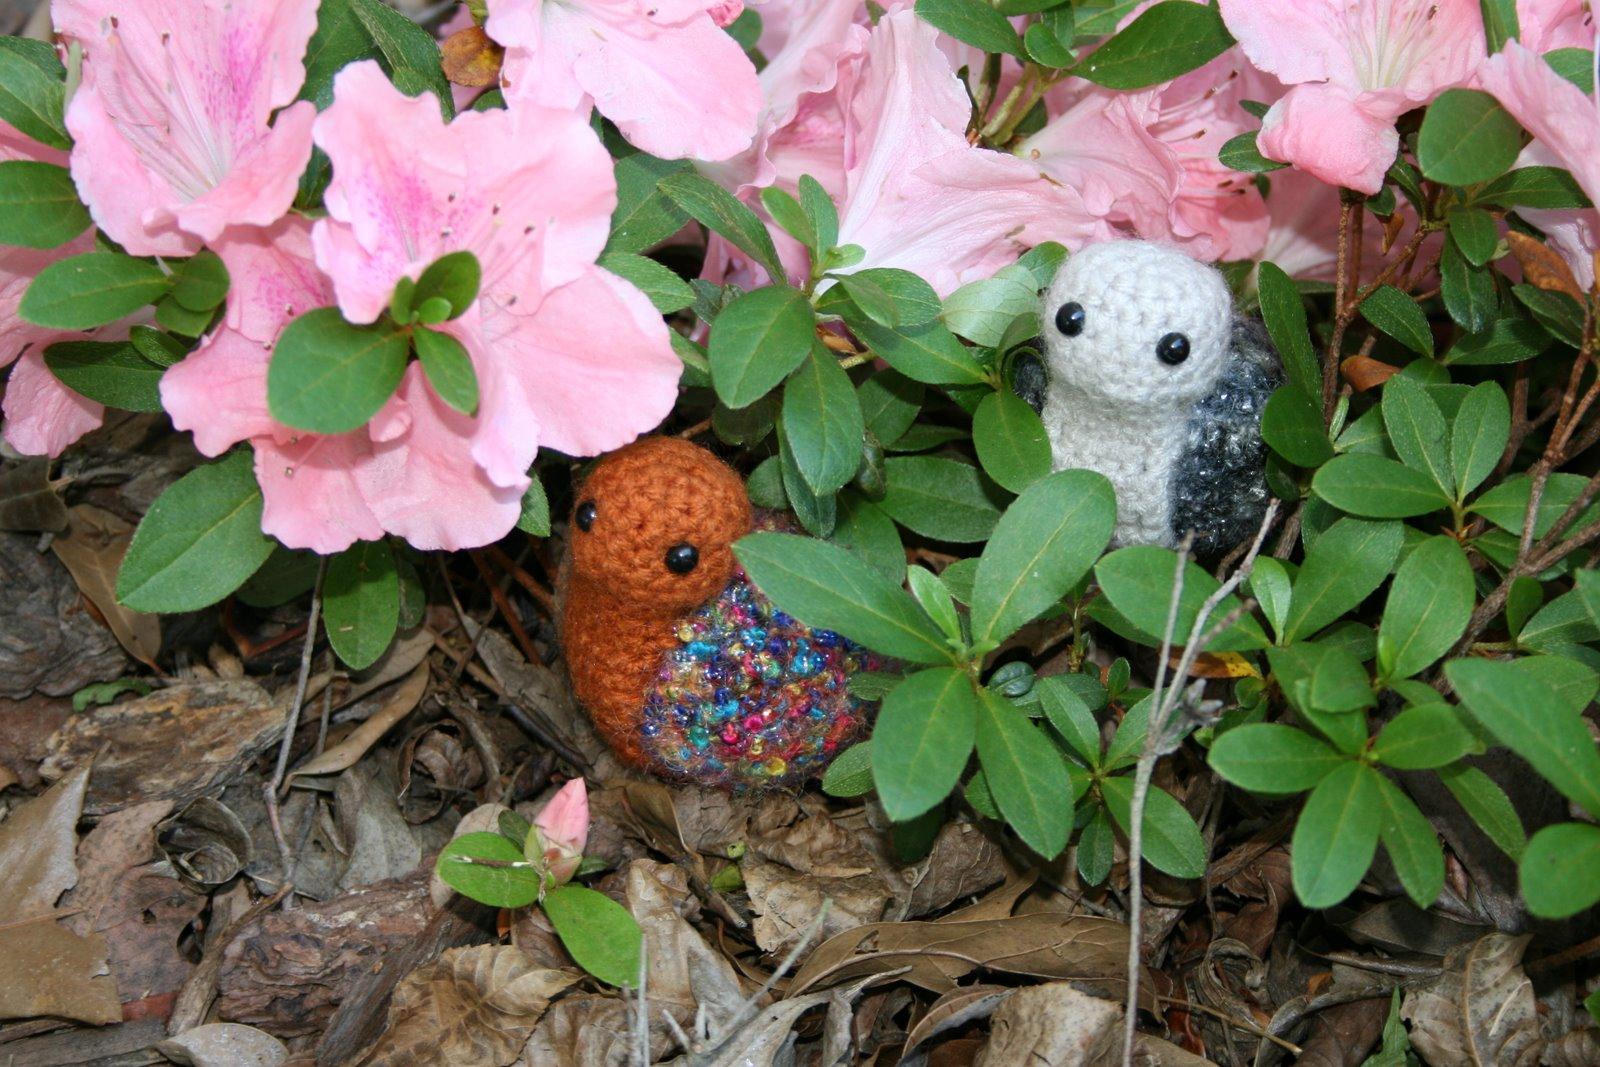 2000 Free Amigurumi Patterns: Snails